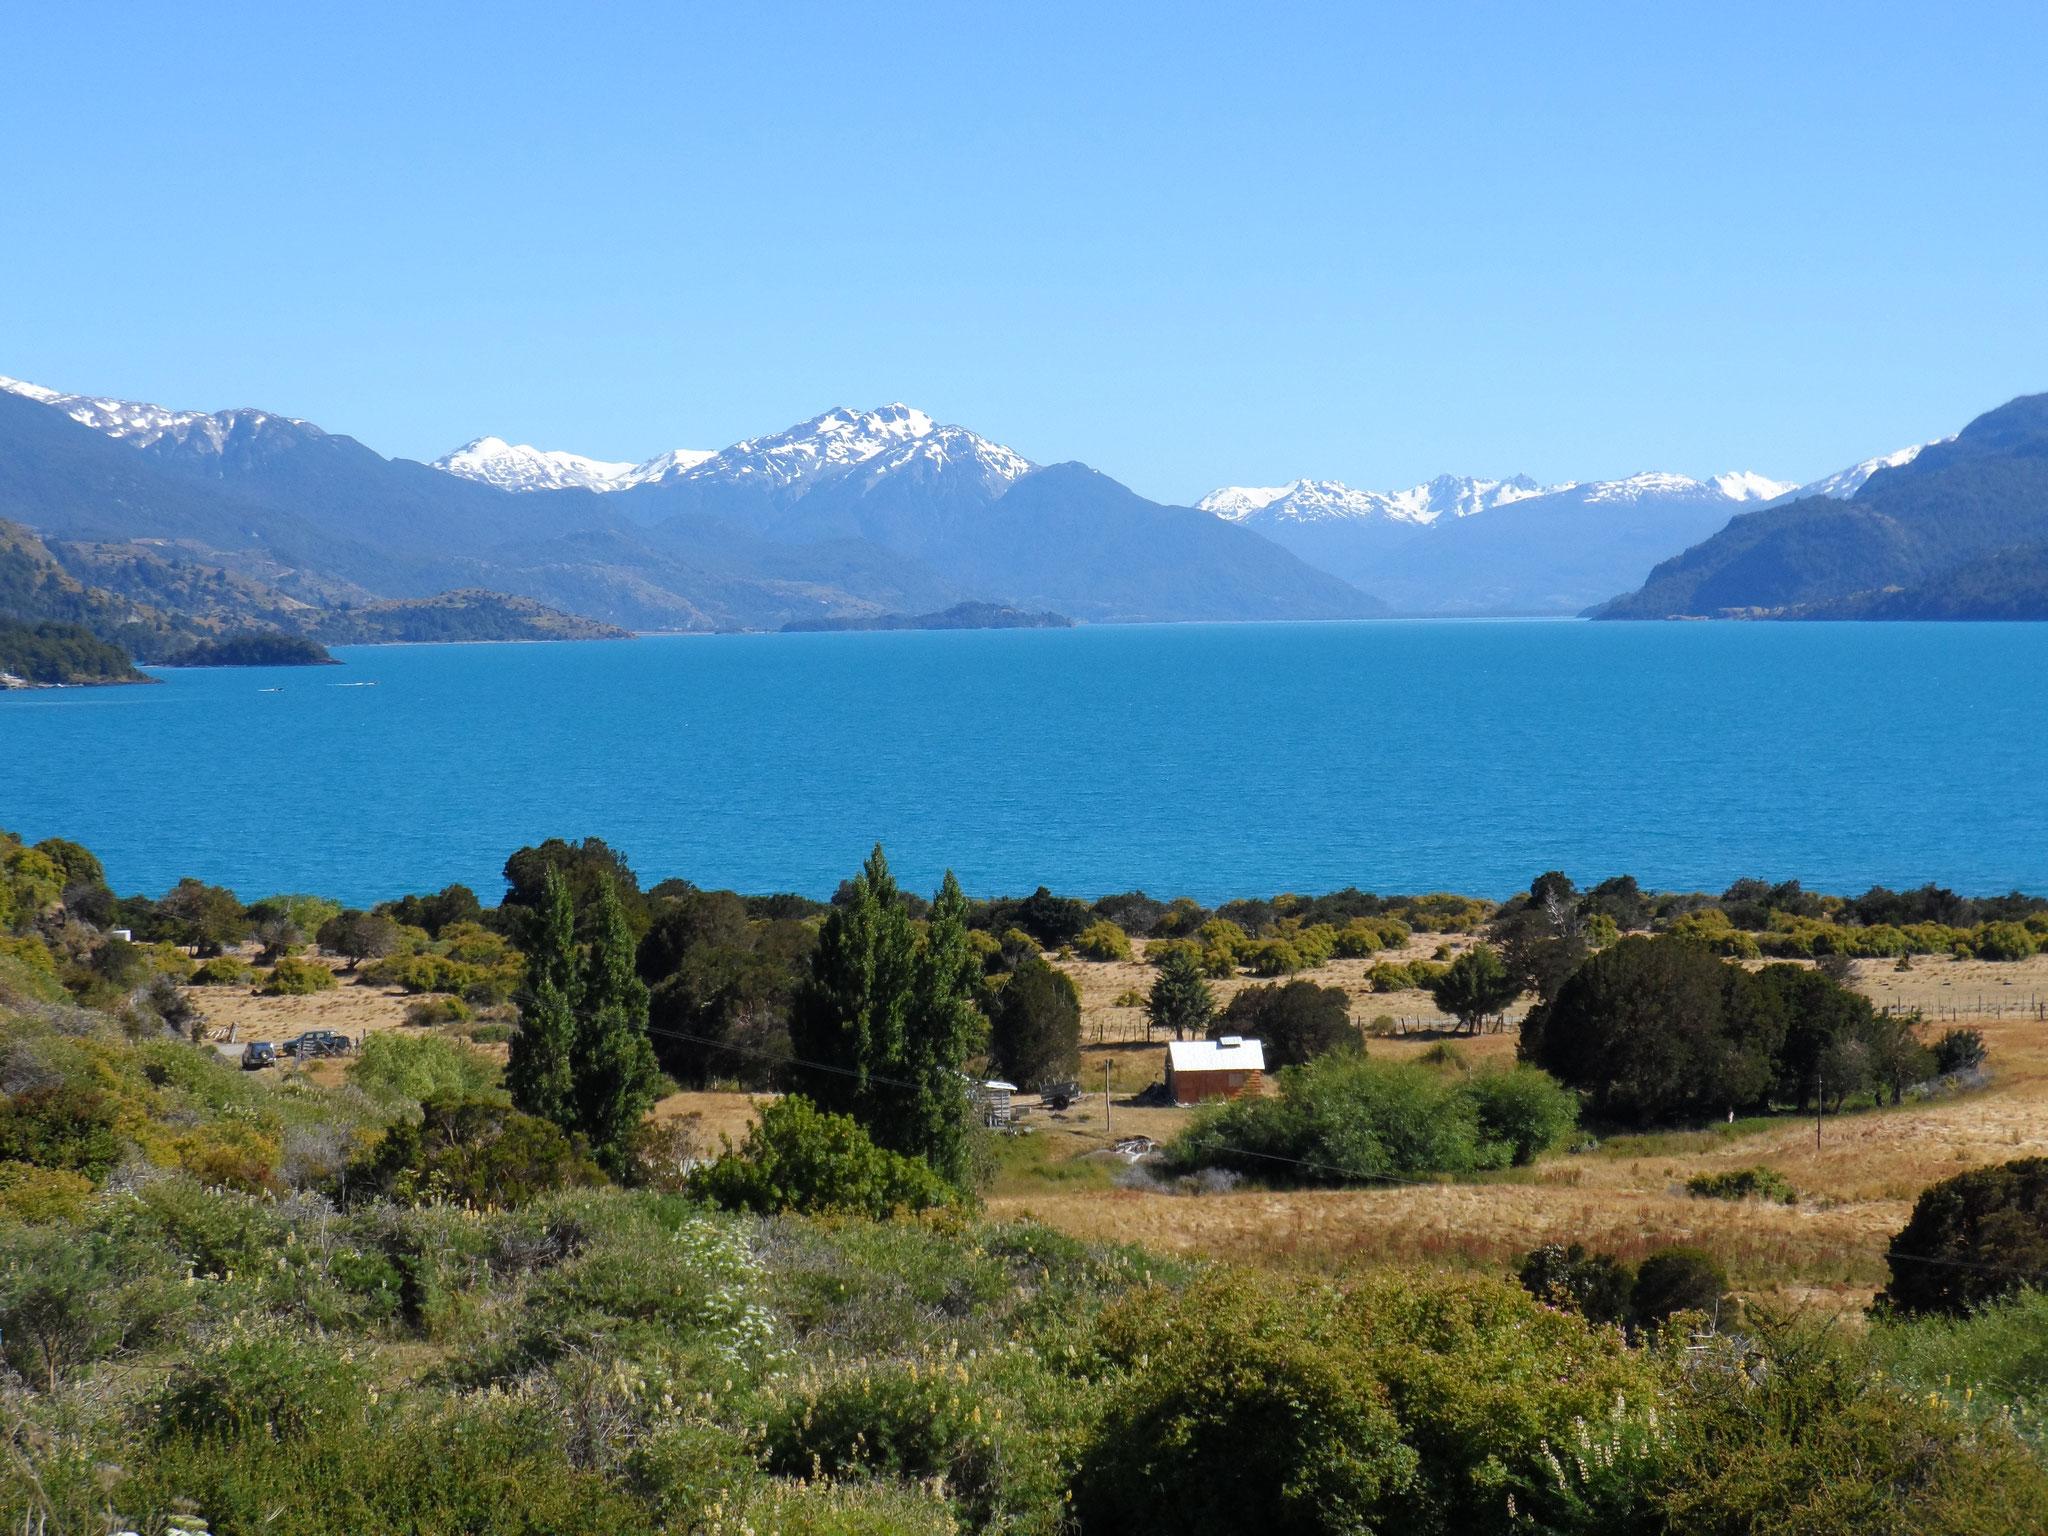 Le lago (lac) General carrera, 2e plus grand d'Amerique du Sud